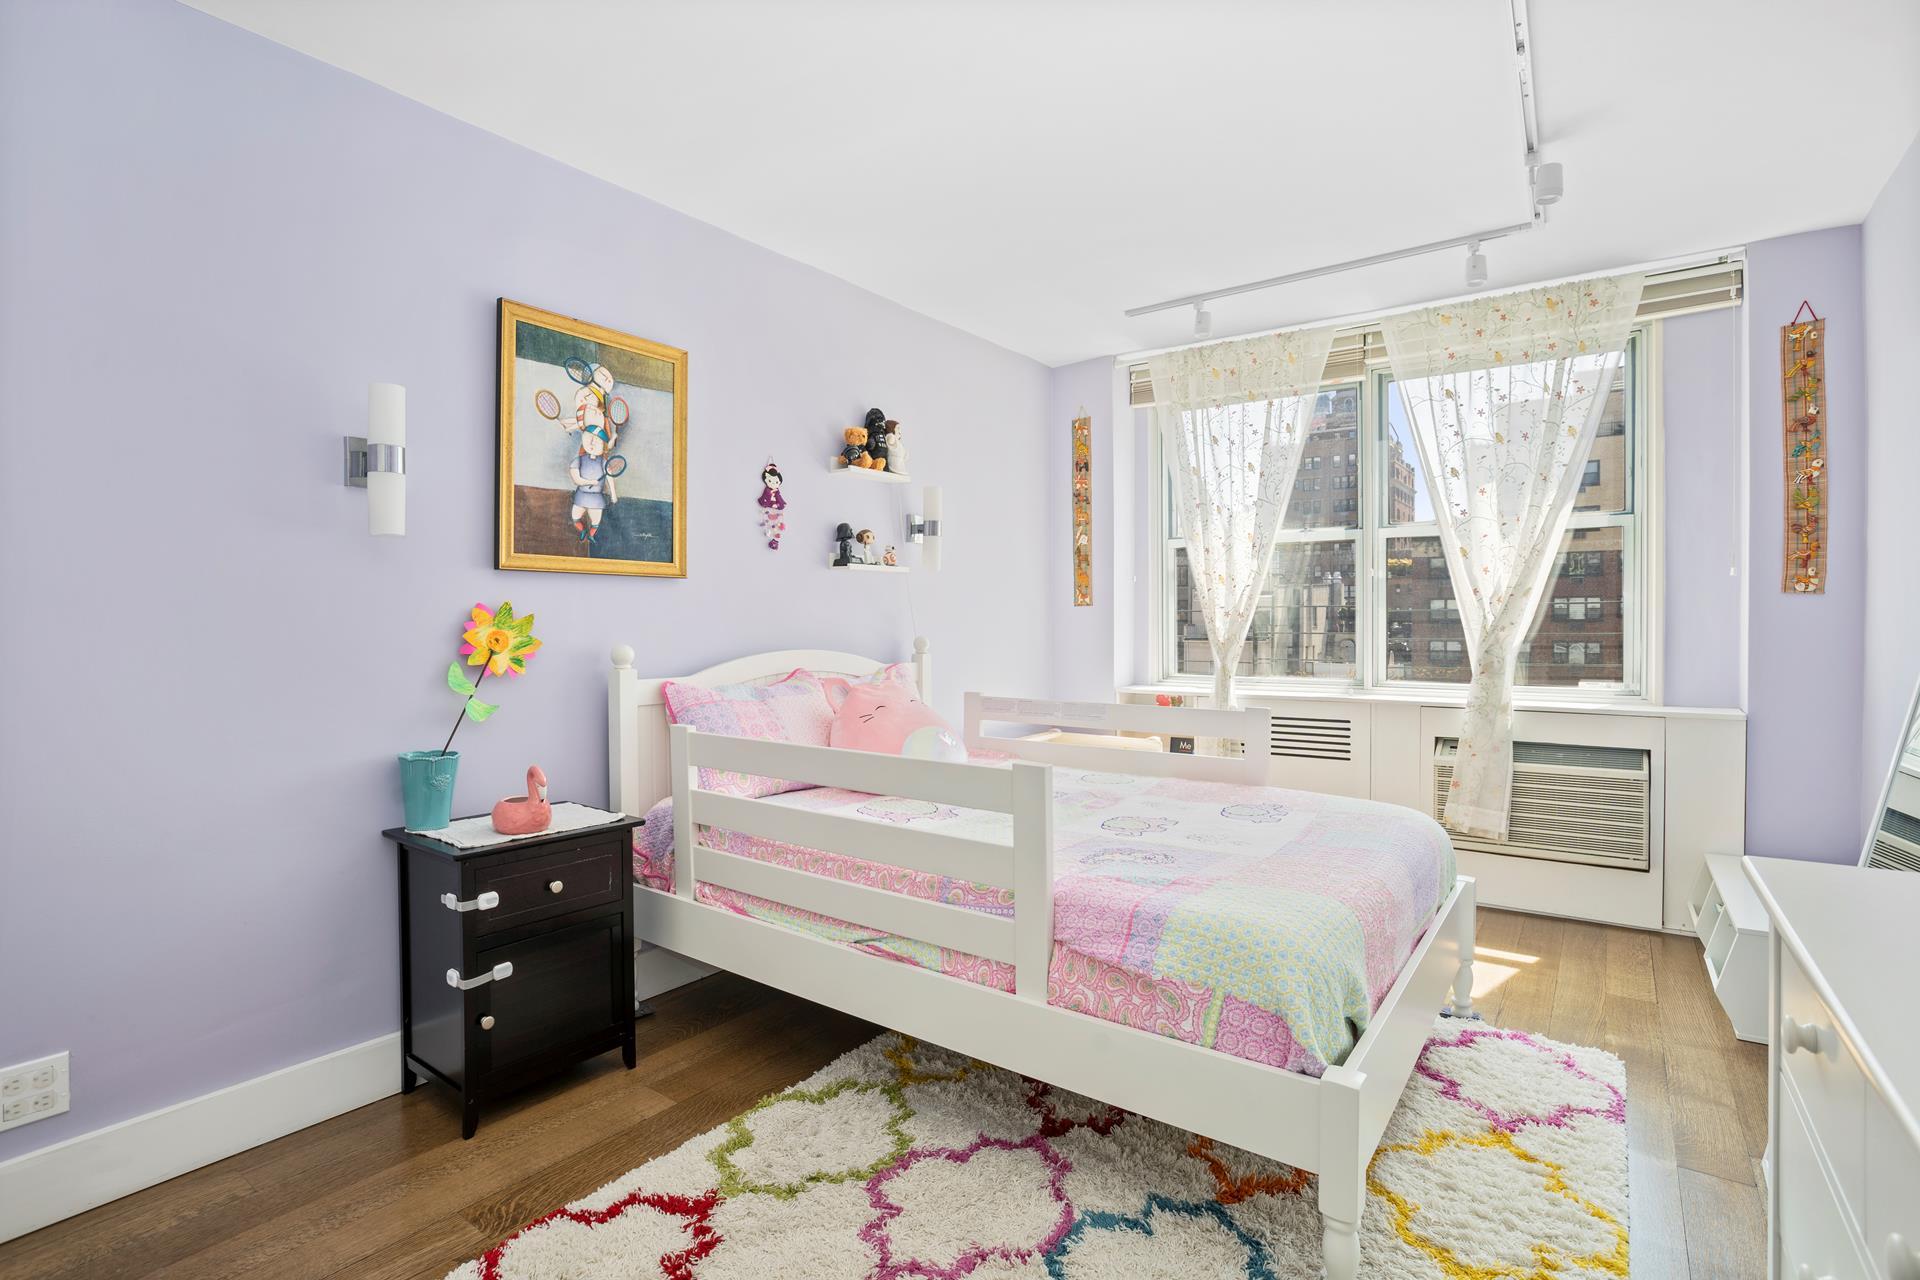 315 East 70th Street Upper East Side New York NY 10021